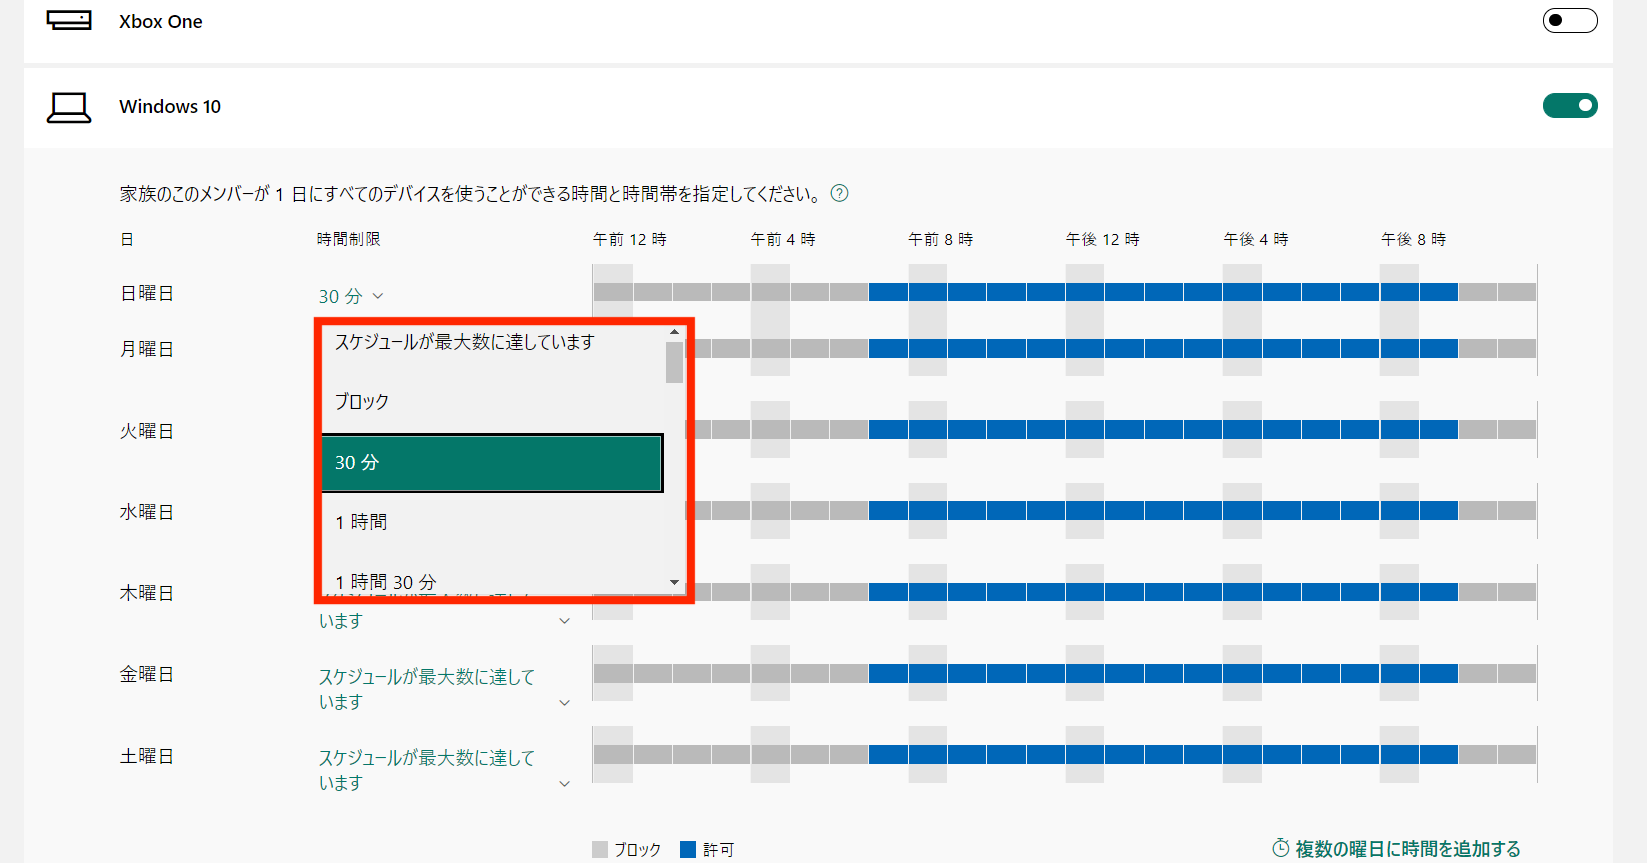 【Windows】ファミリー機能の使い方7